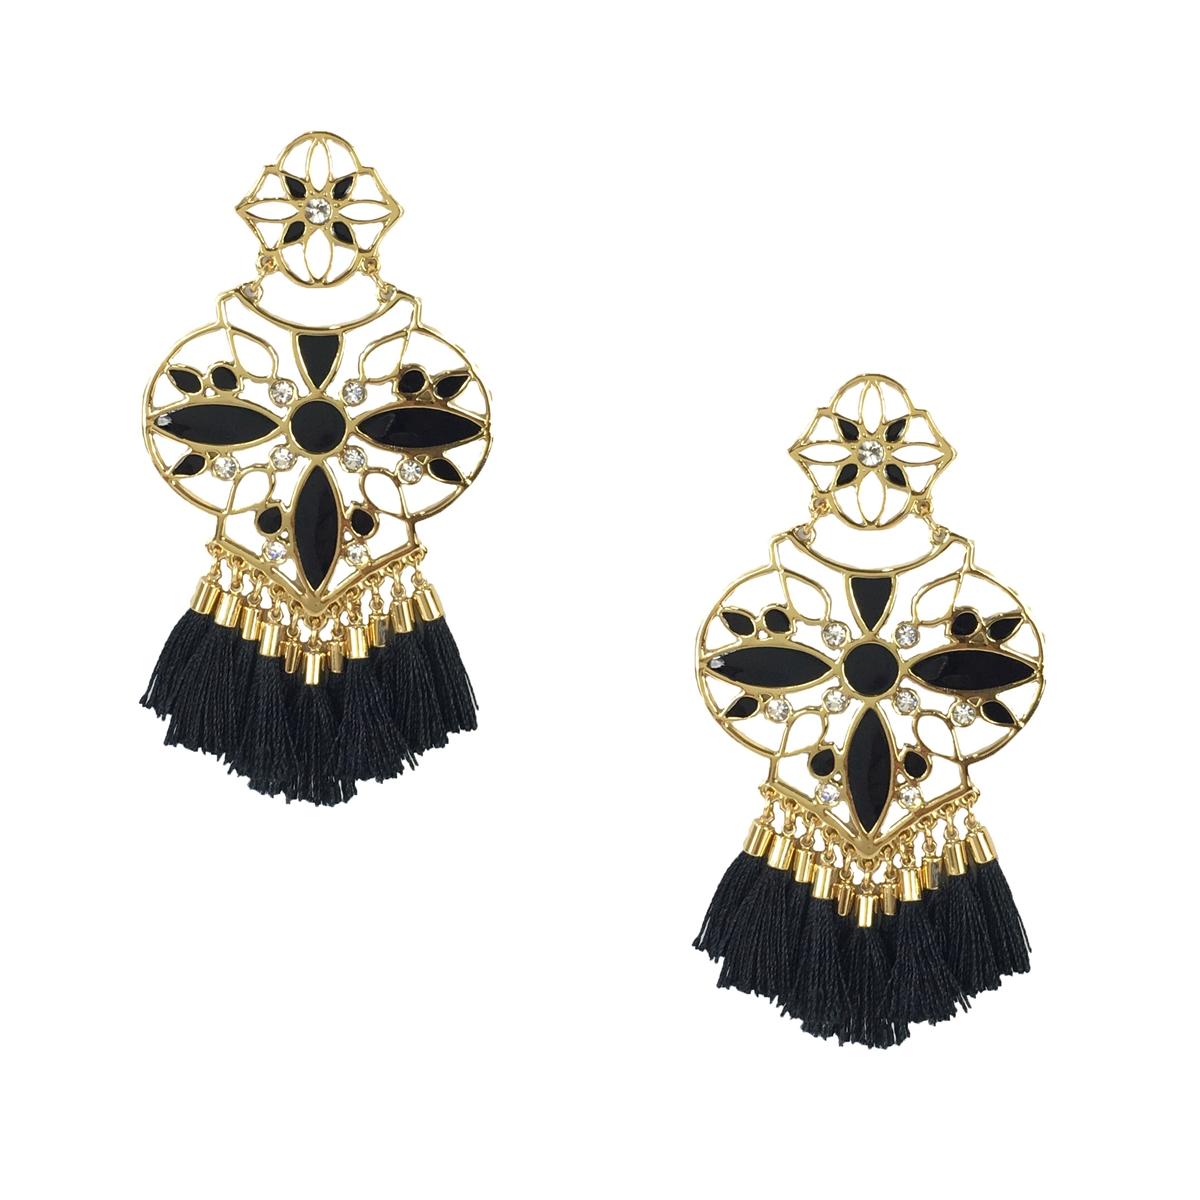 29c6ba265cac9 Kate Spade Moroccan Tile Chandelier Earrings, Black